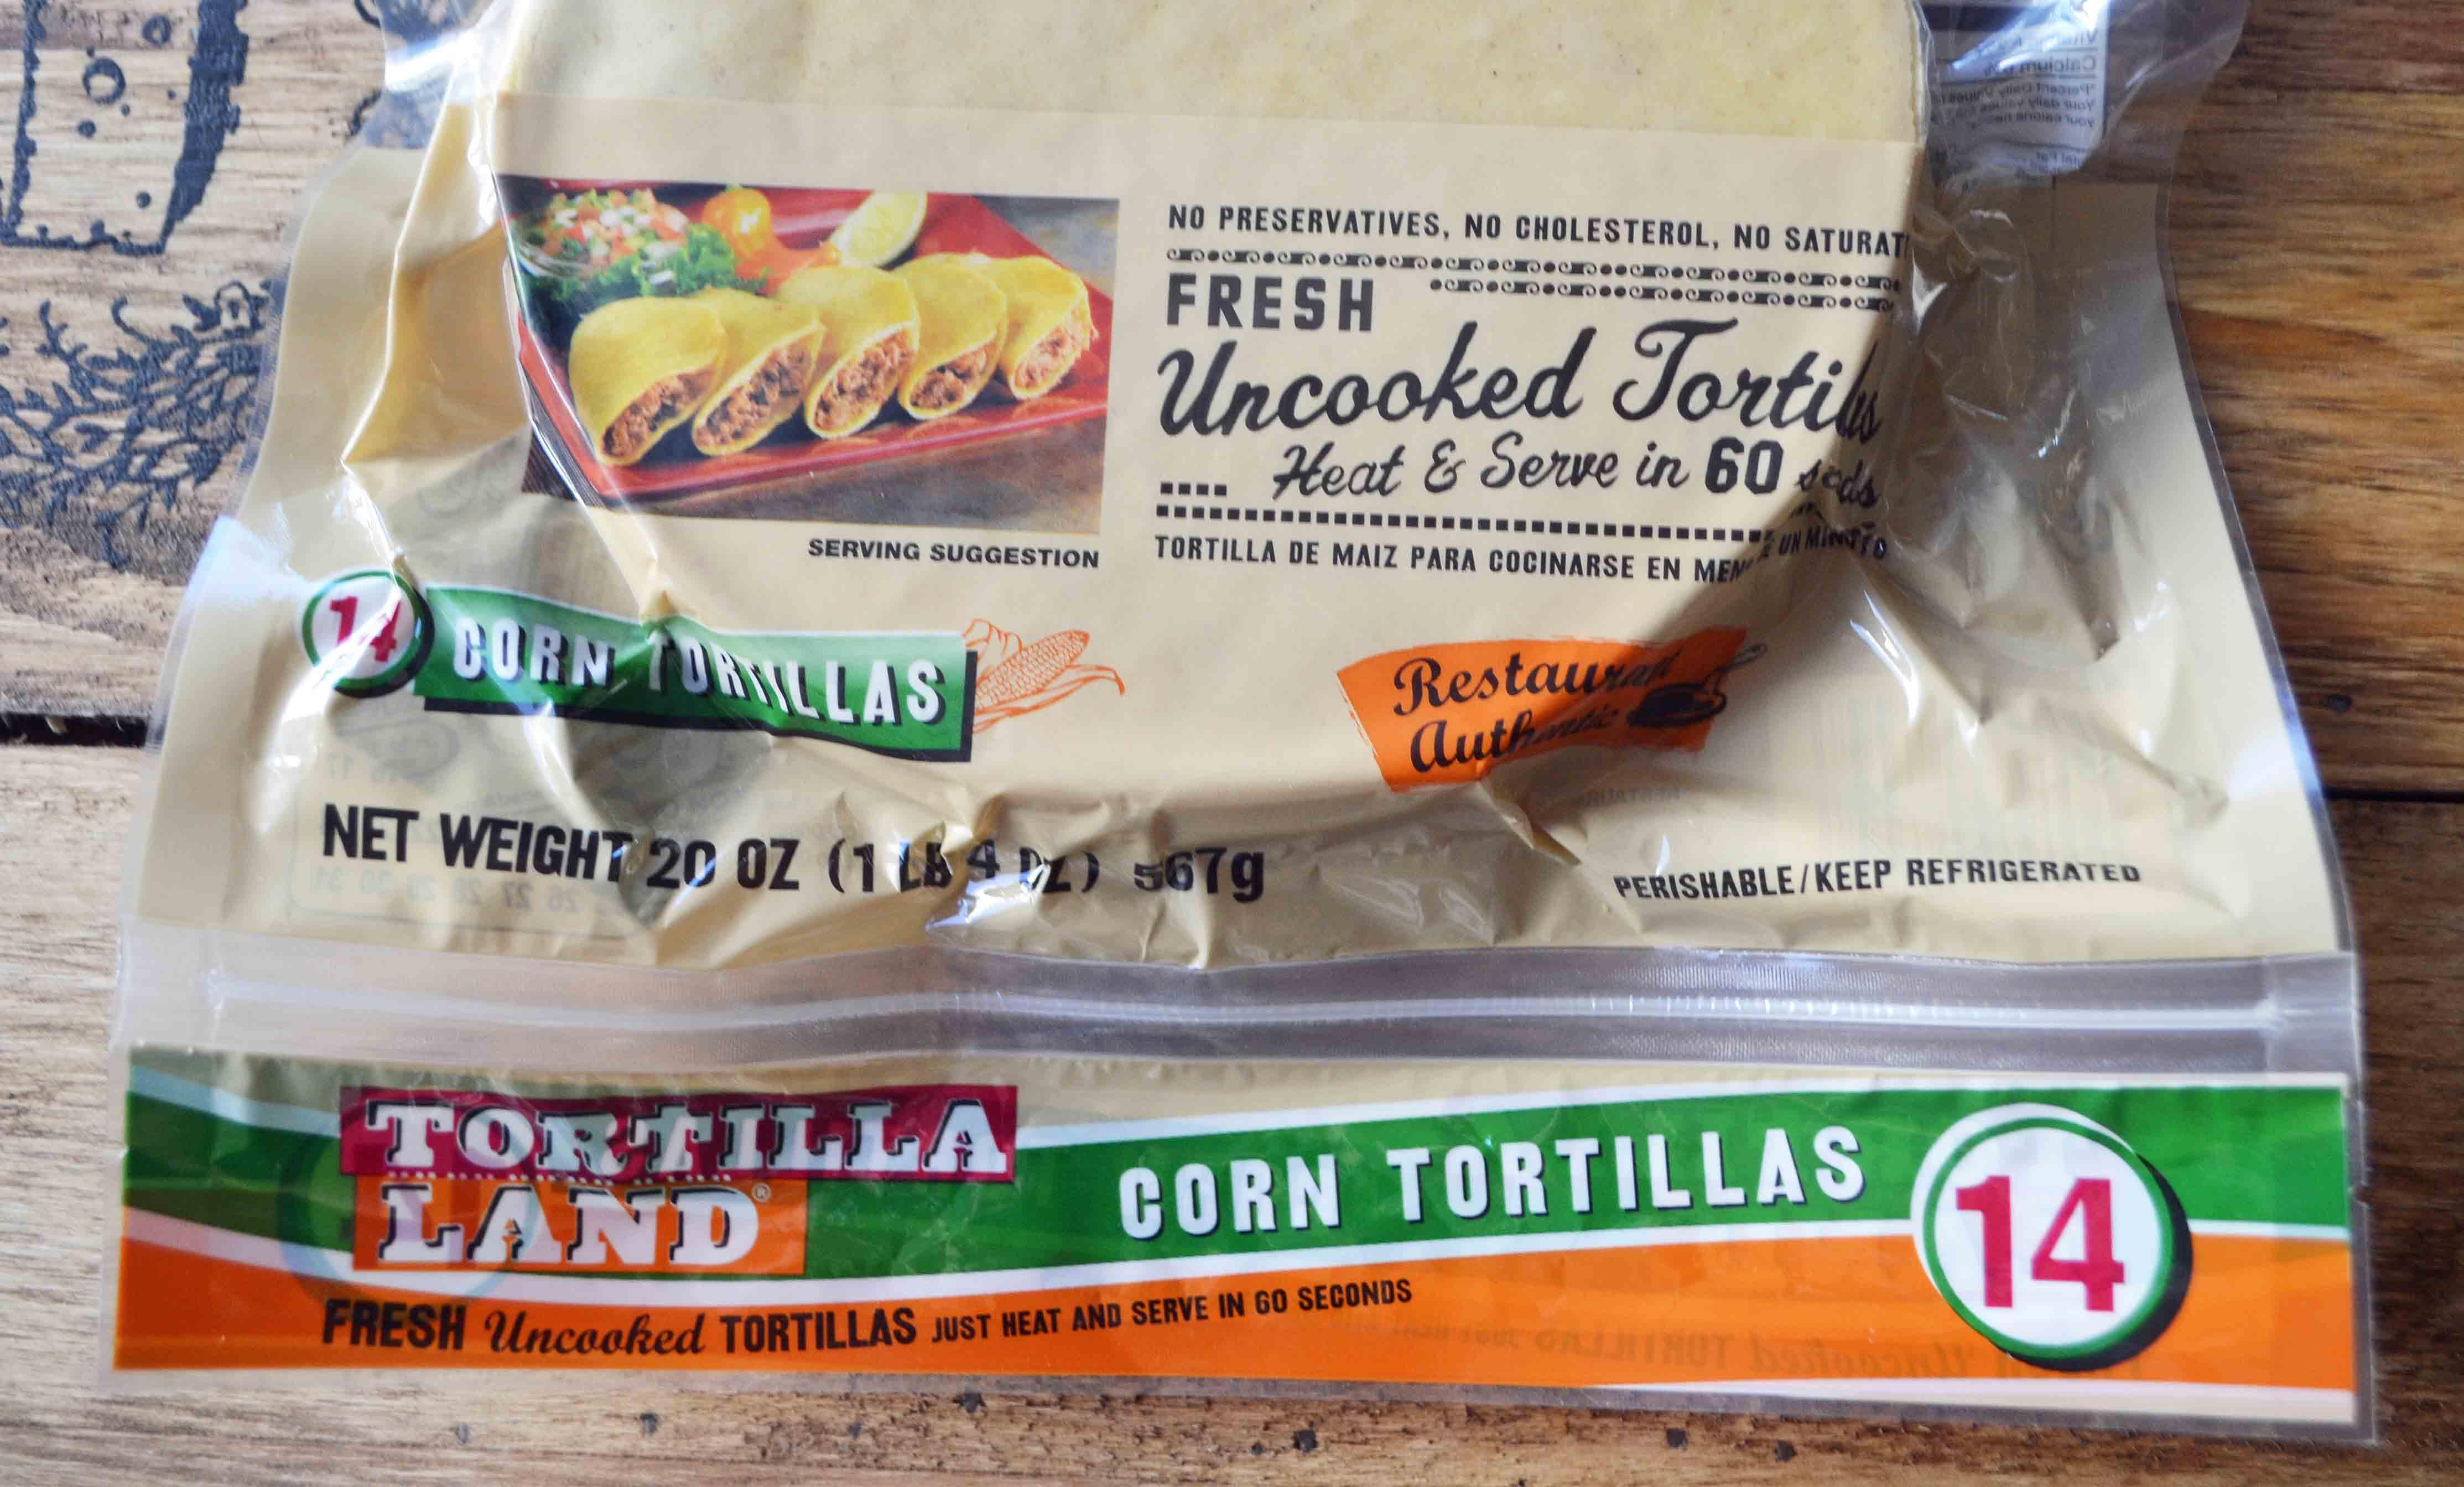 Chicken Poblano Sweet Potato Tacos by Modern Honey l Tortilla Land Uncooked Corn Tortillas - 60 calories each